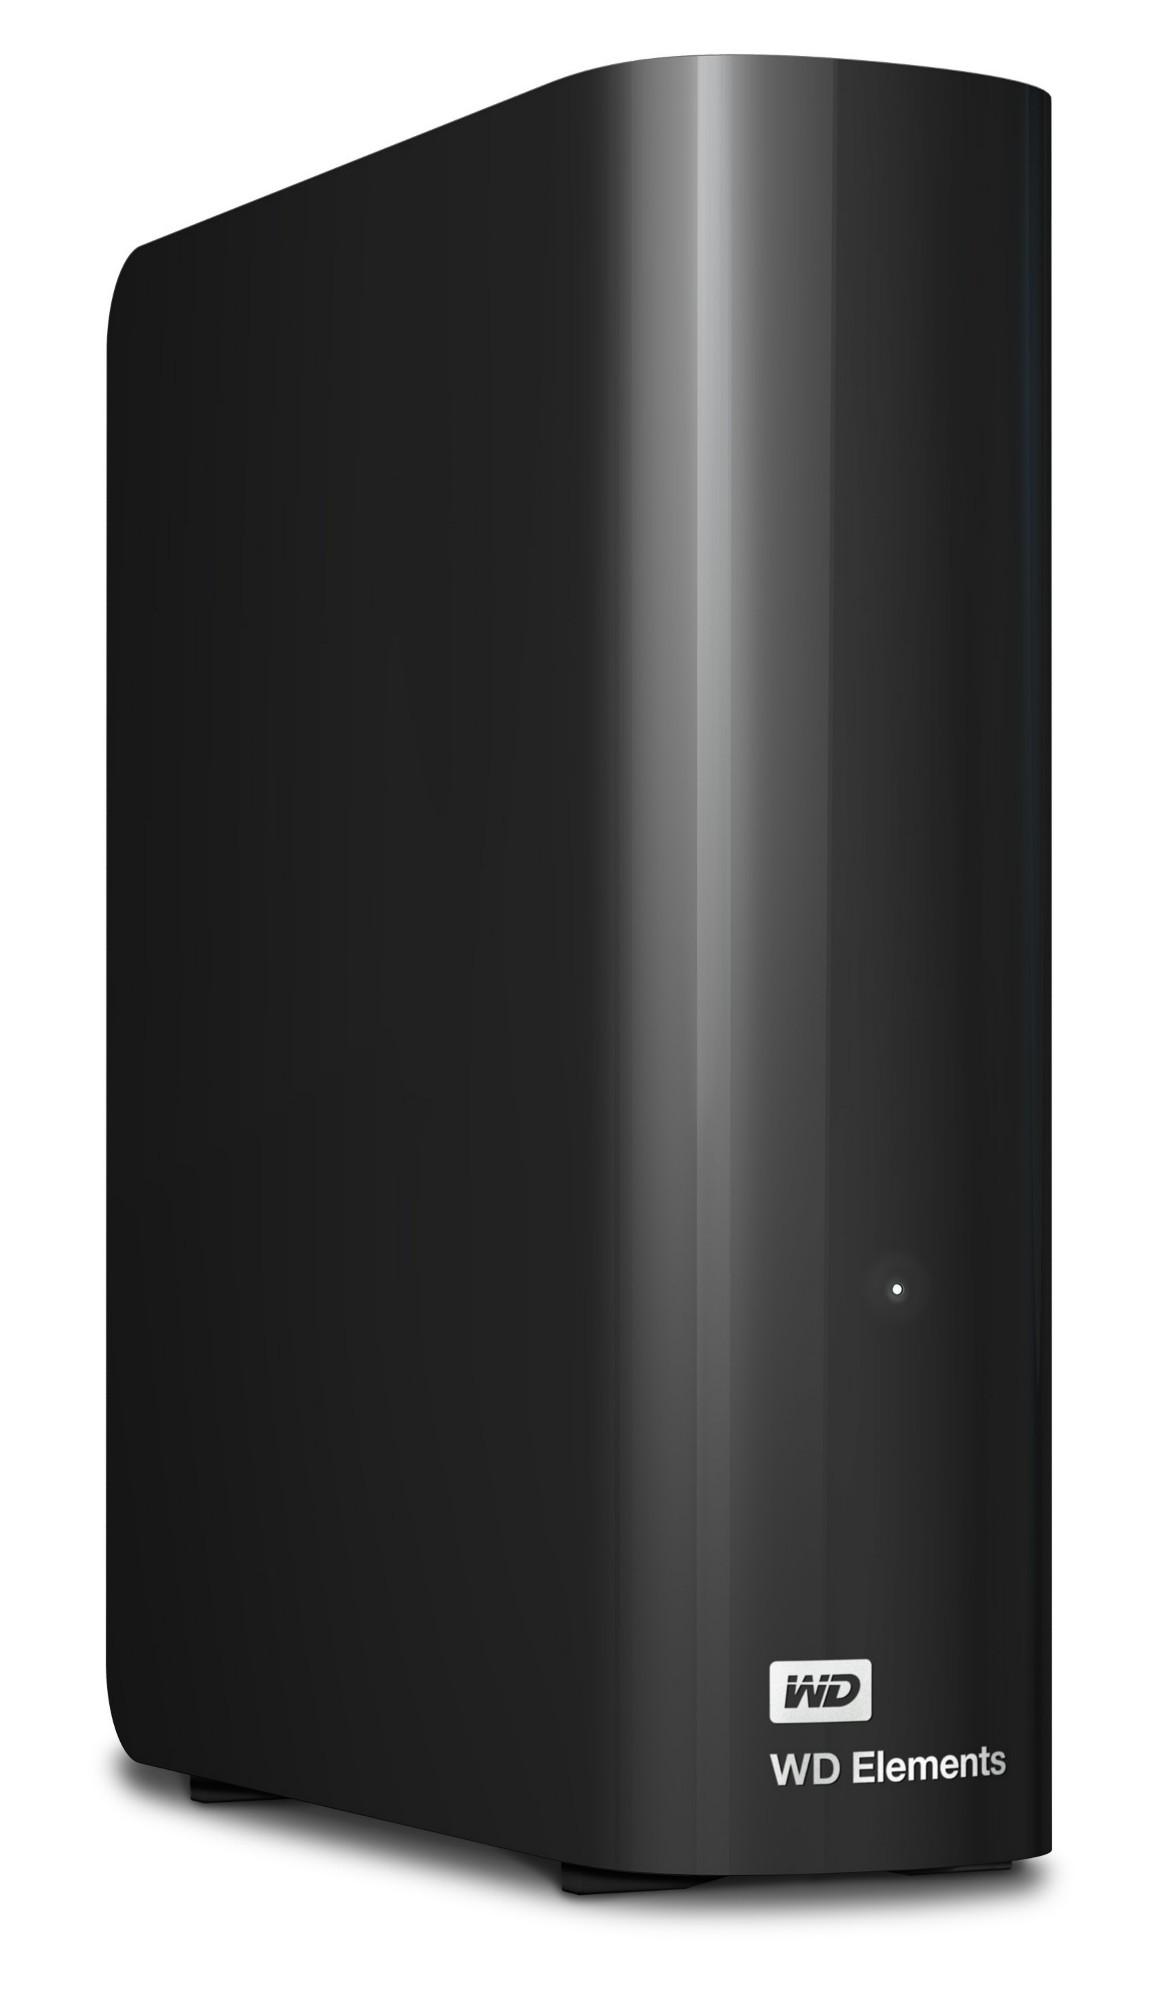 Western Digital WD Elements Desktop 2000GB Black external hard drive